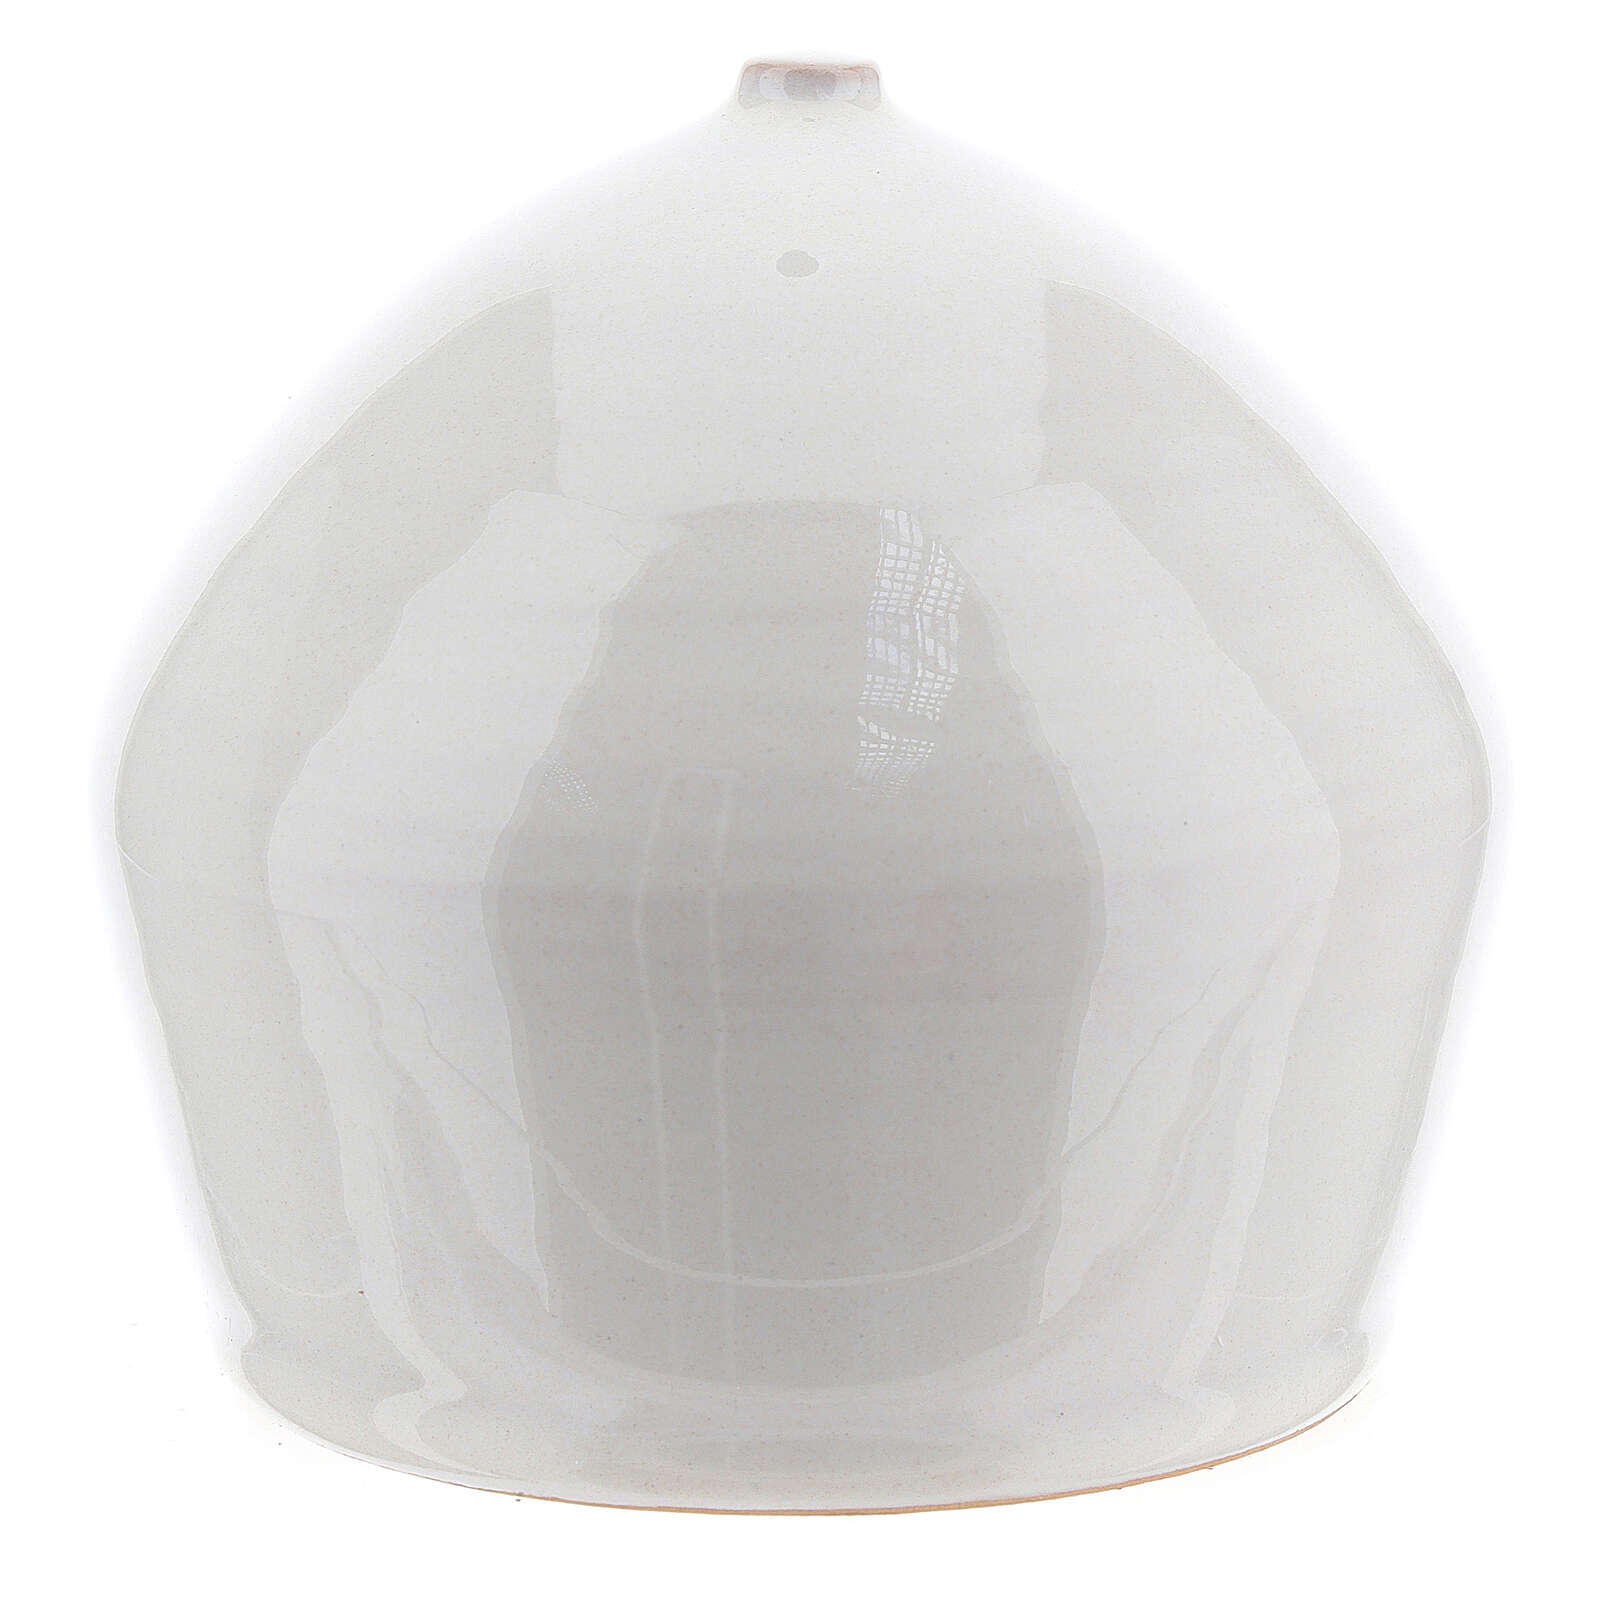 Presepe moderno terracotta bianca apertura squadrata 12x11 cm 4